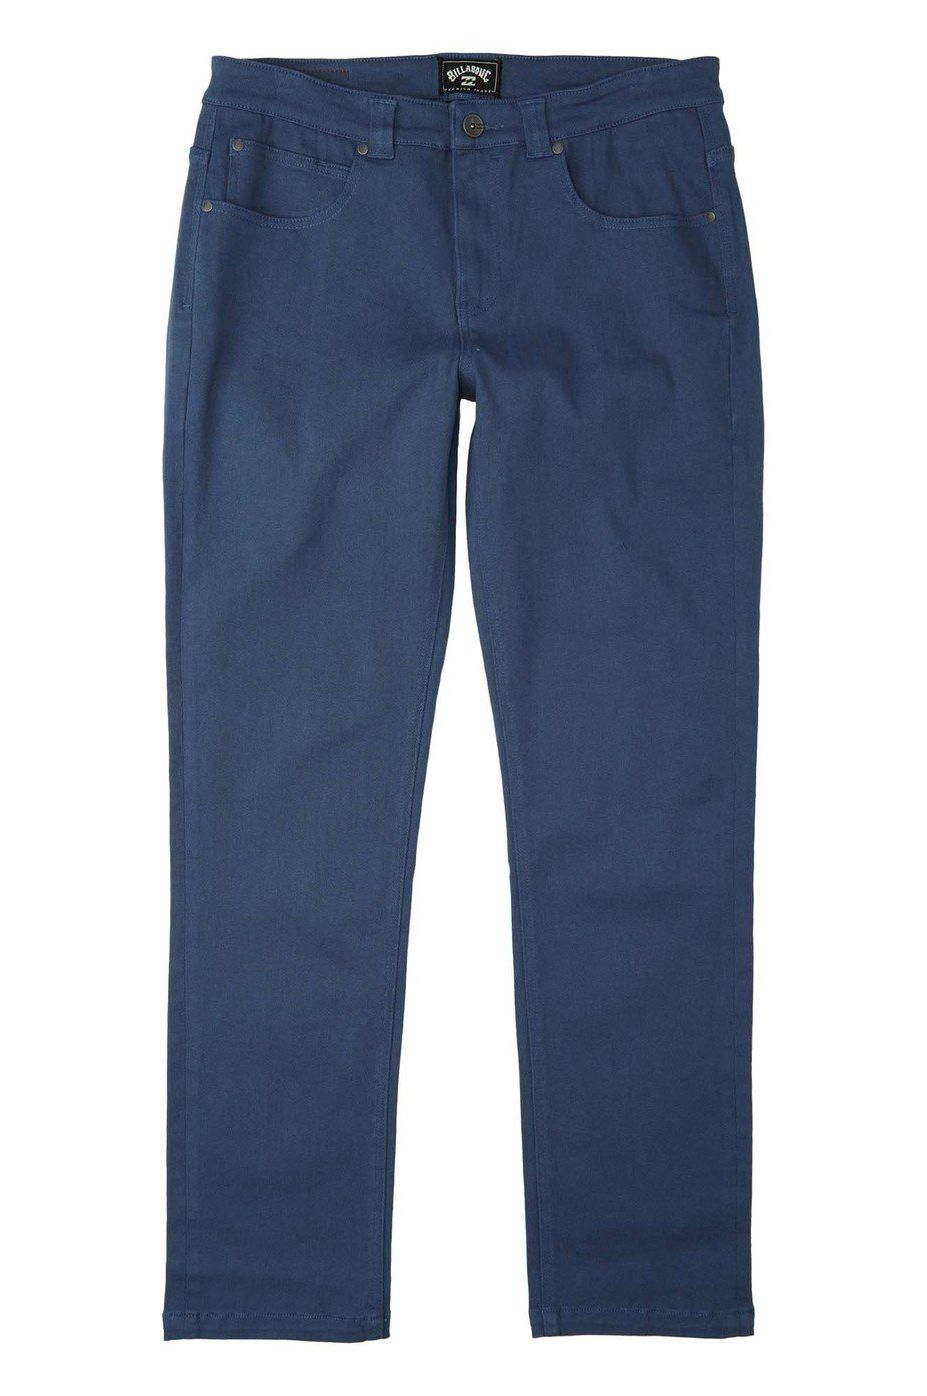 Billabong Pant Jeans 73 JEAN Denim Blue